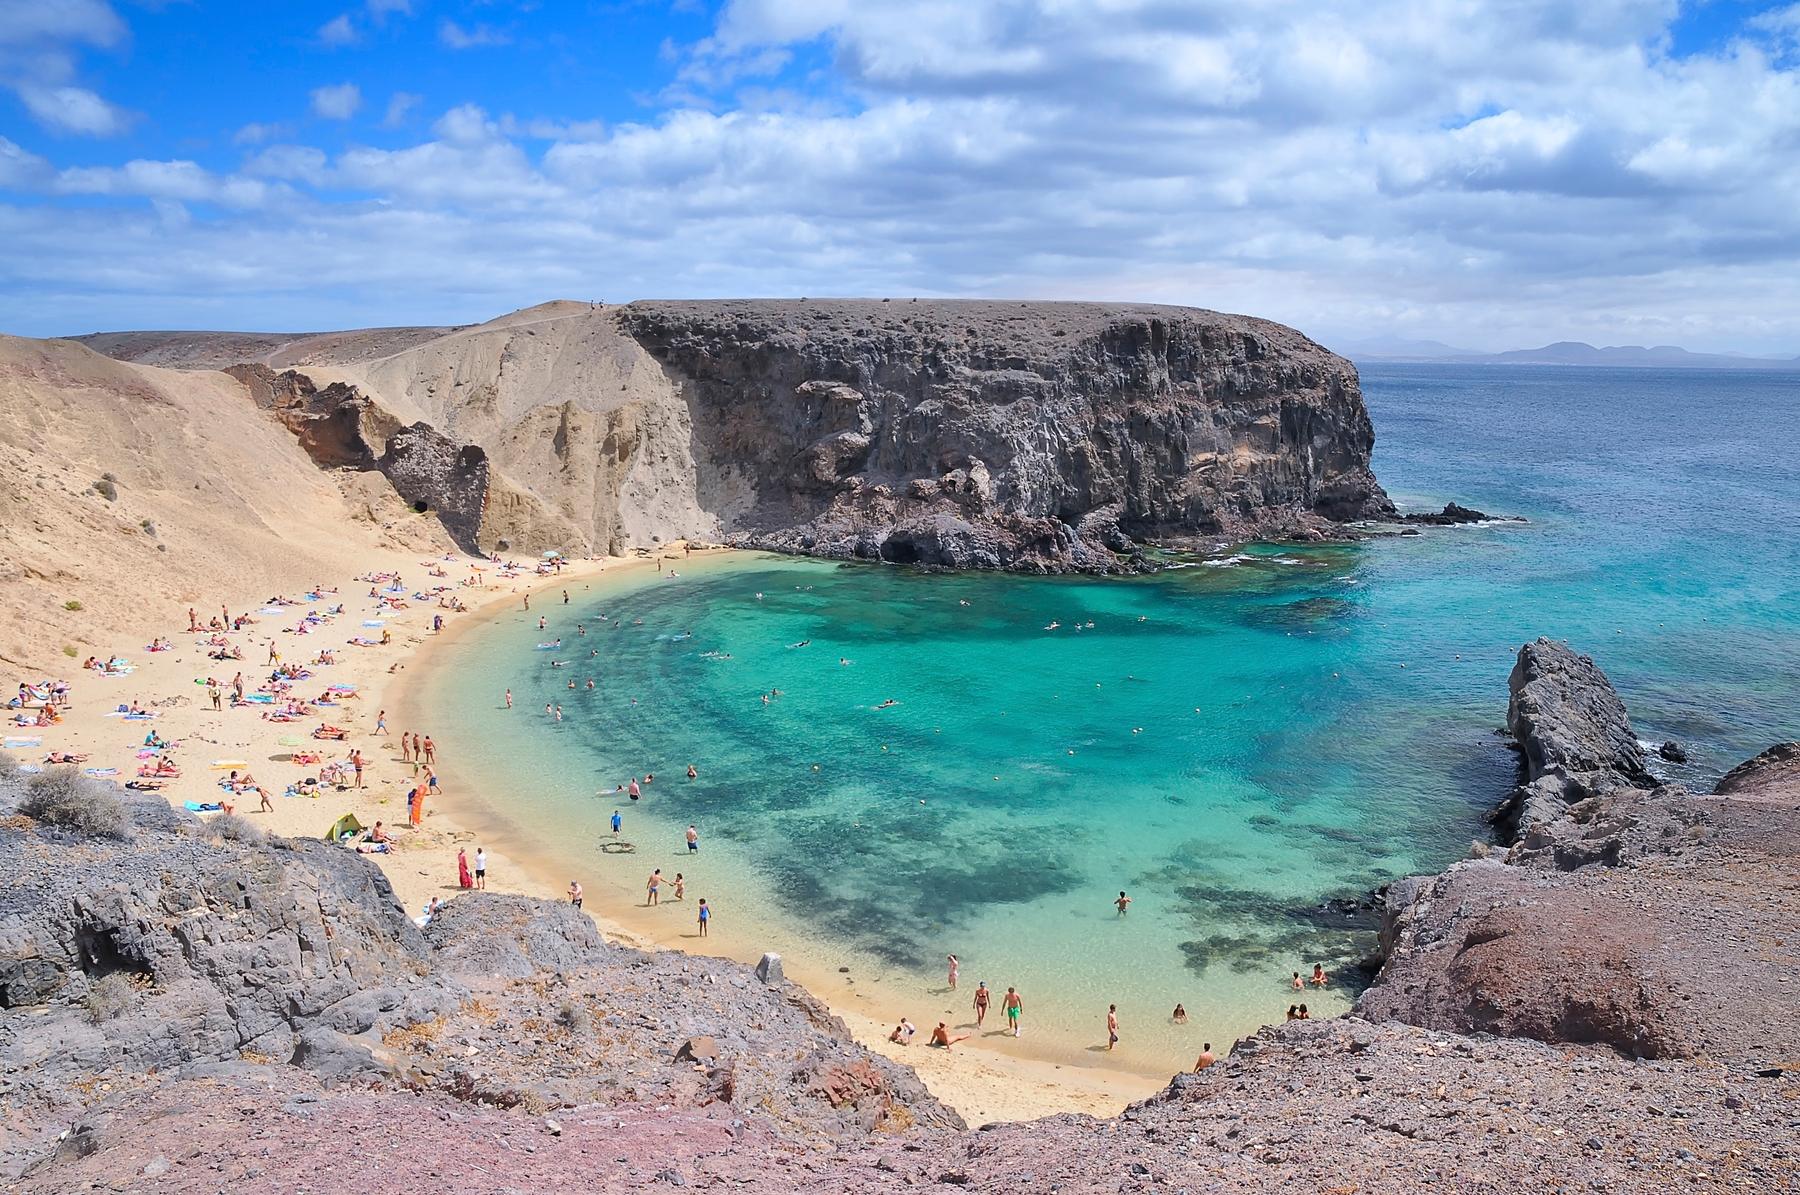 Dove andare a marzo in vacanza: Lanzarote